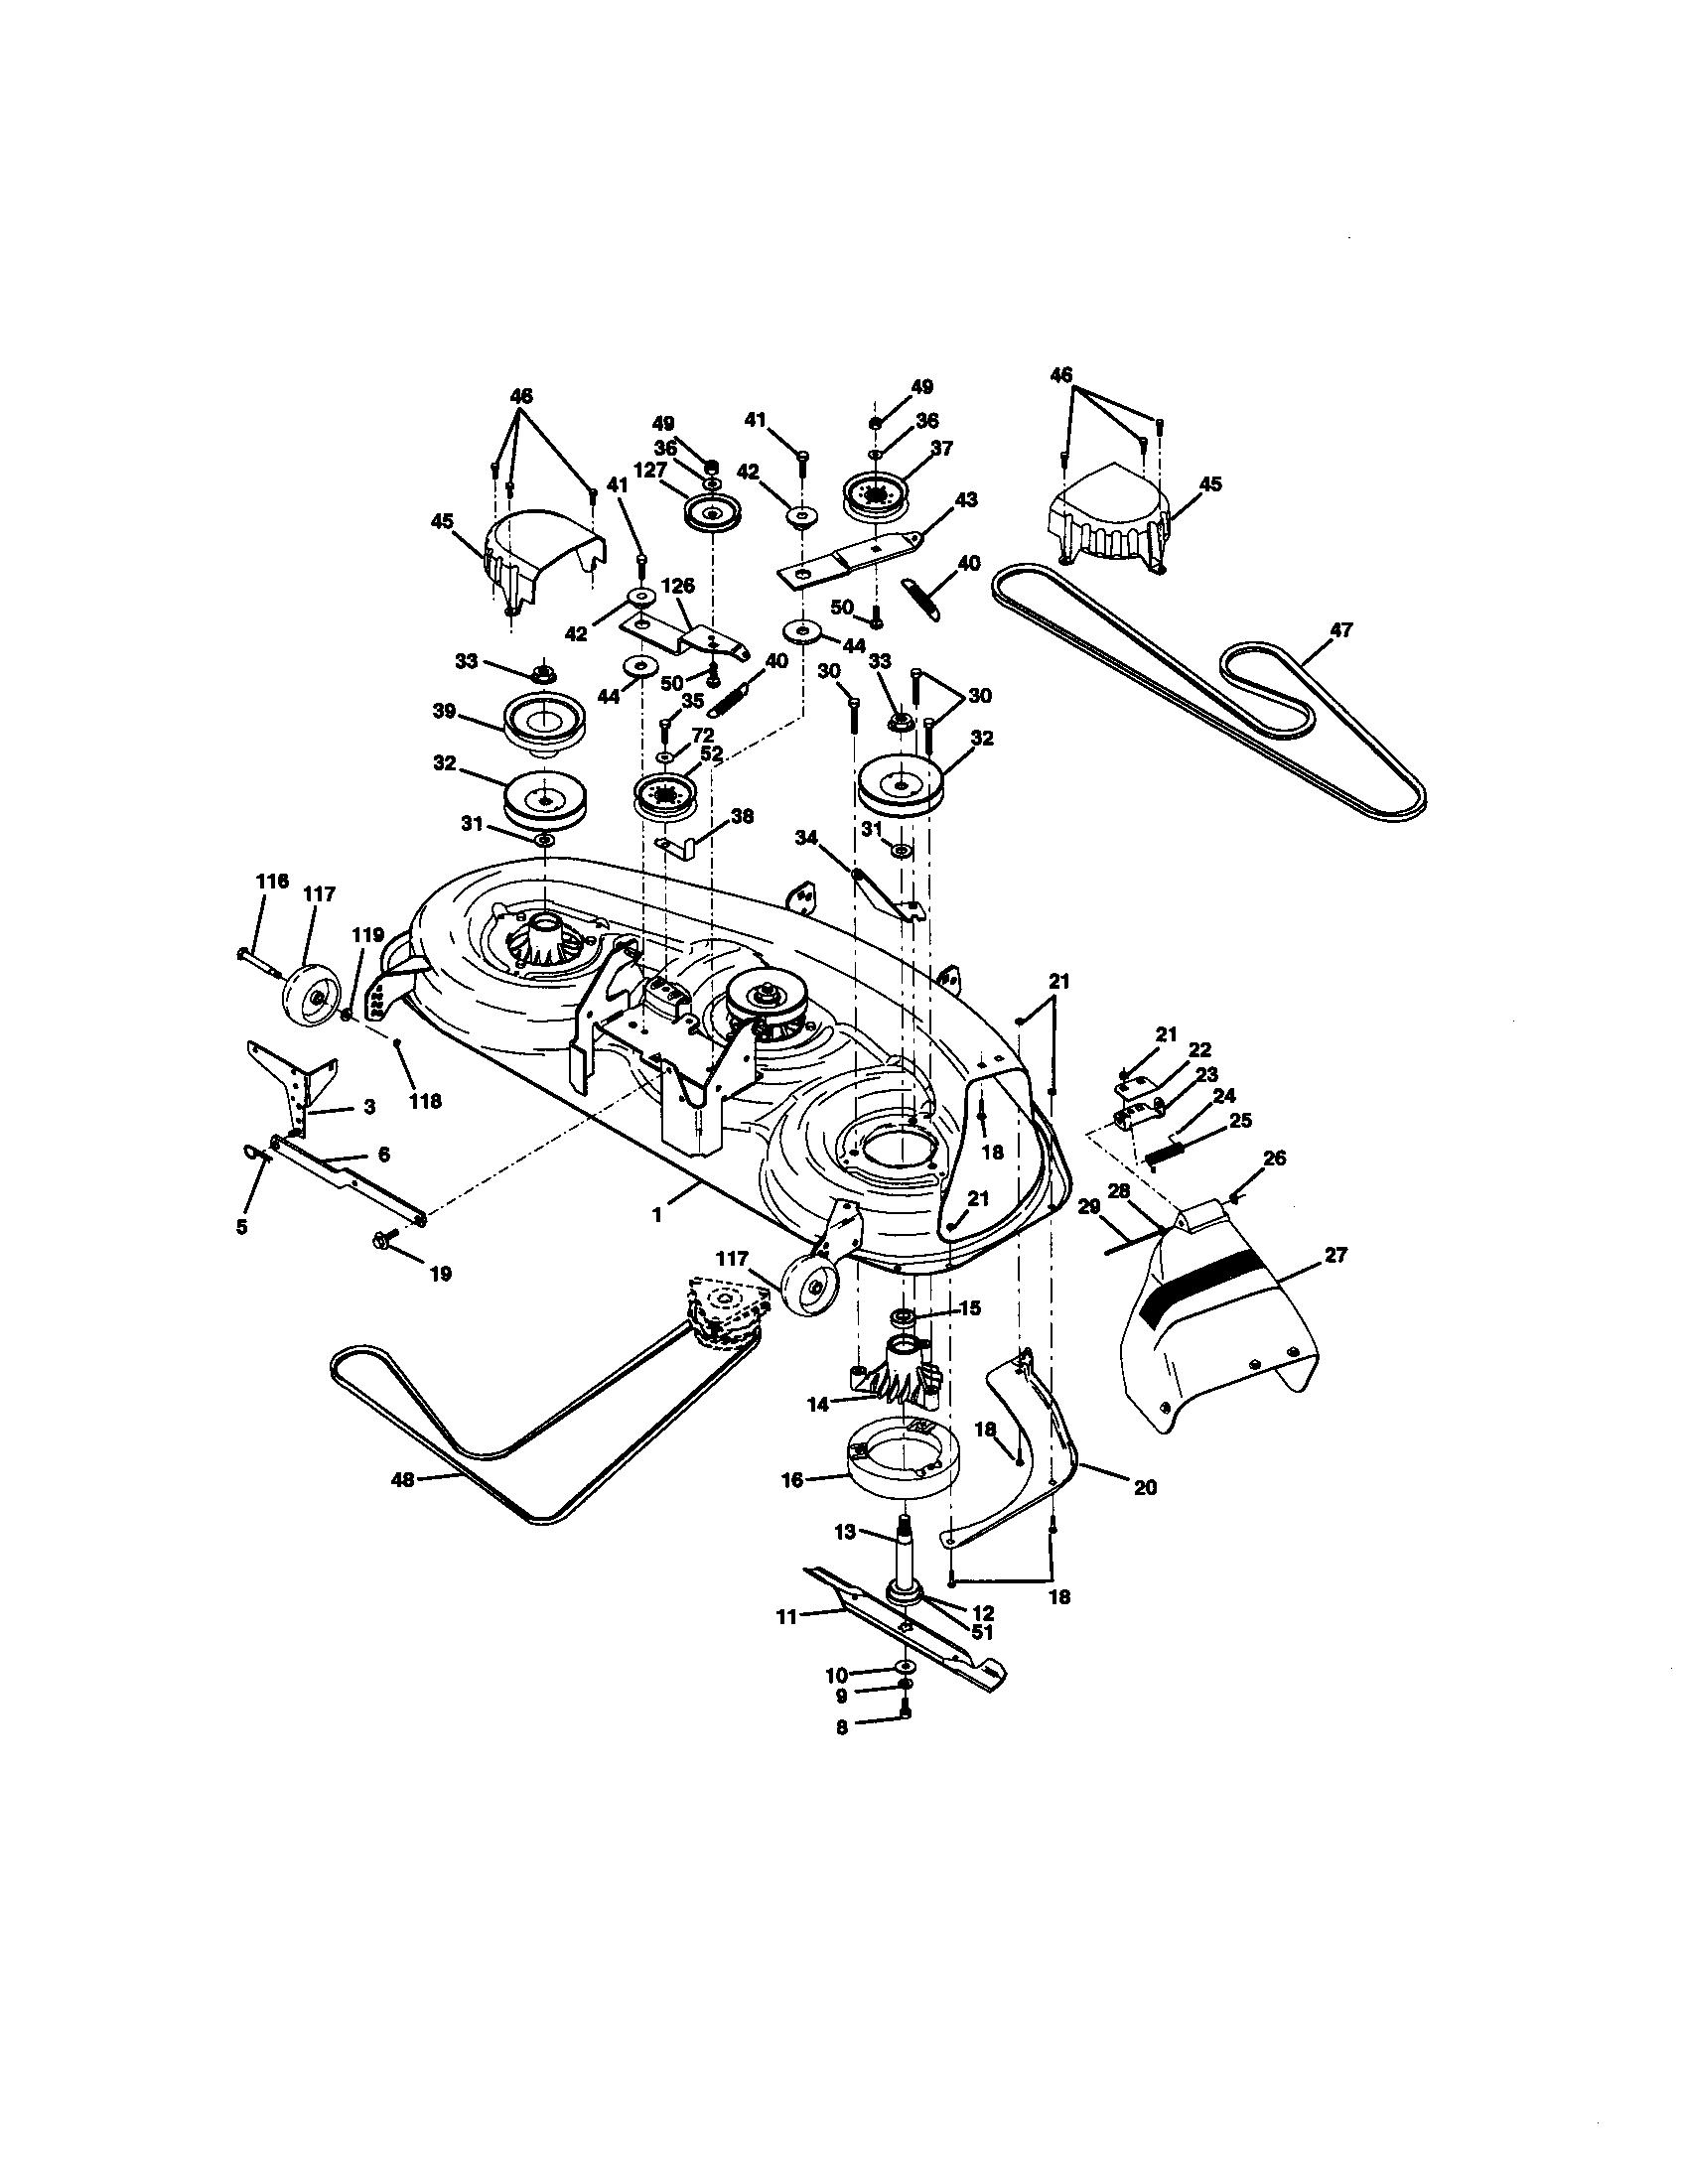 Dixon Lawn Mower Wiring Diagram Free Download